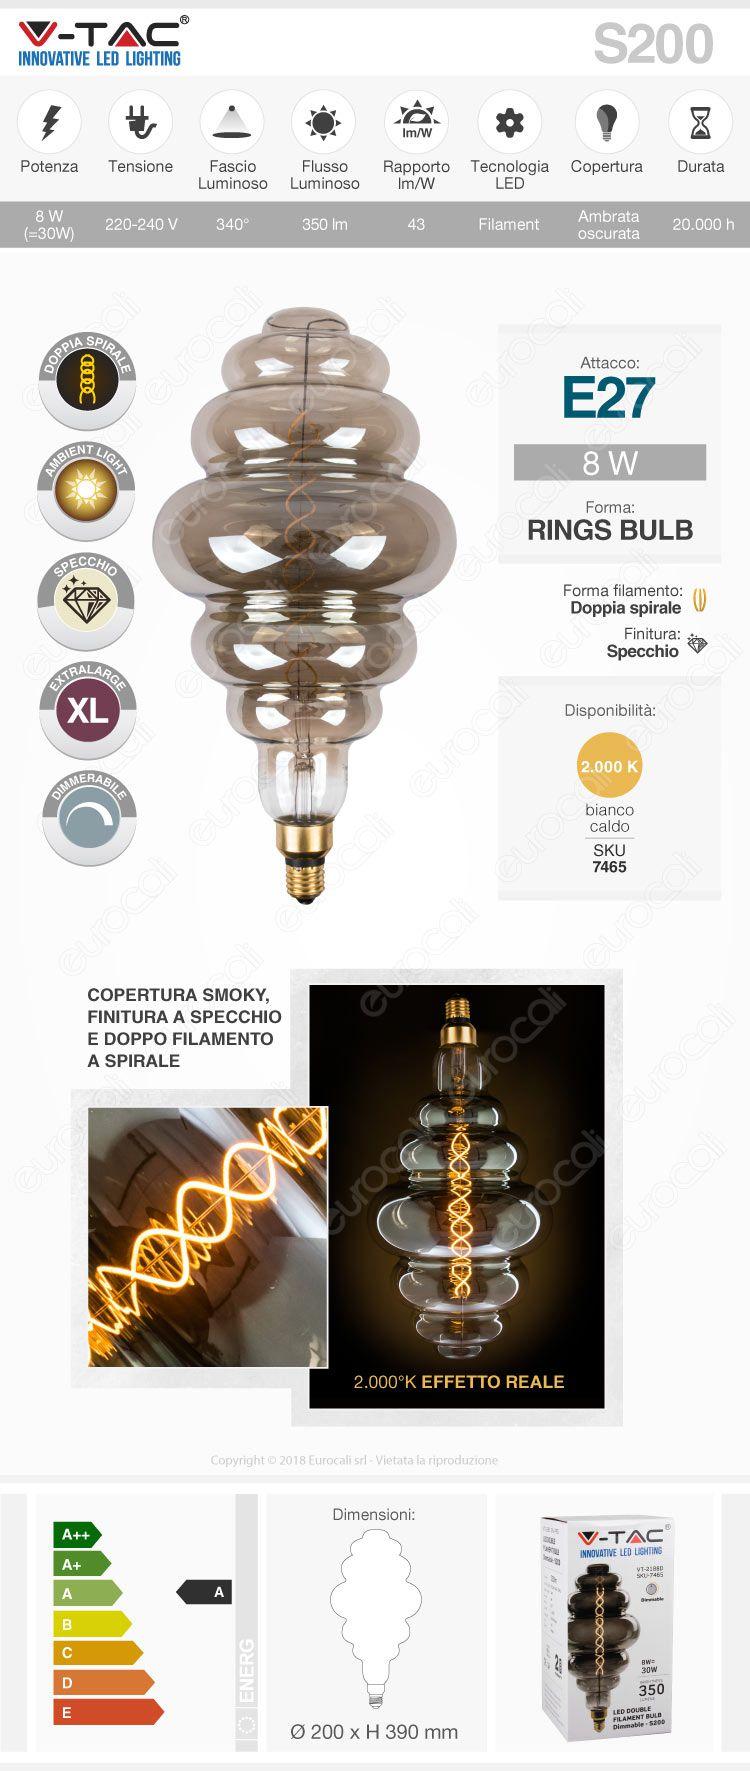 V-Tac VT-2188D Lampadina E27 Filamento LED 8W Rings Bulb Vetro Ambrato Oscurato Dimmerabile